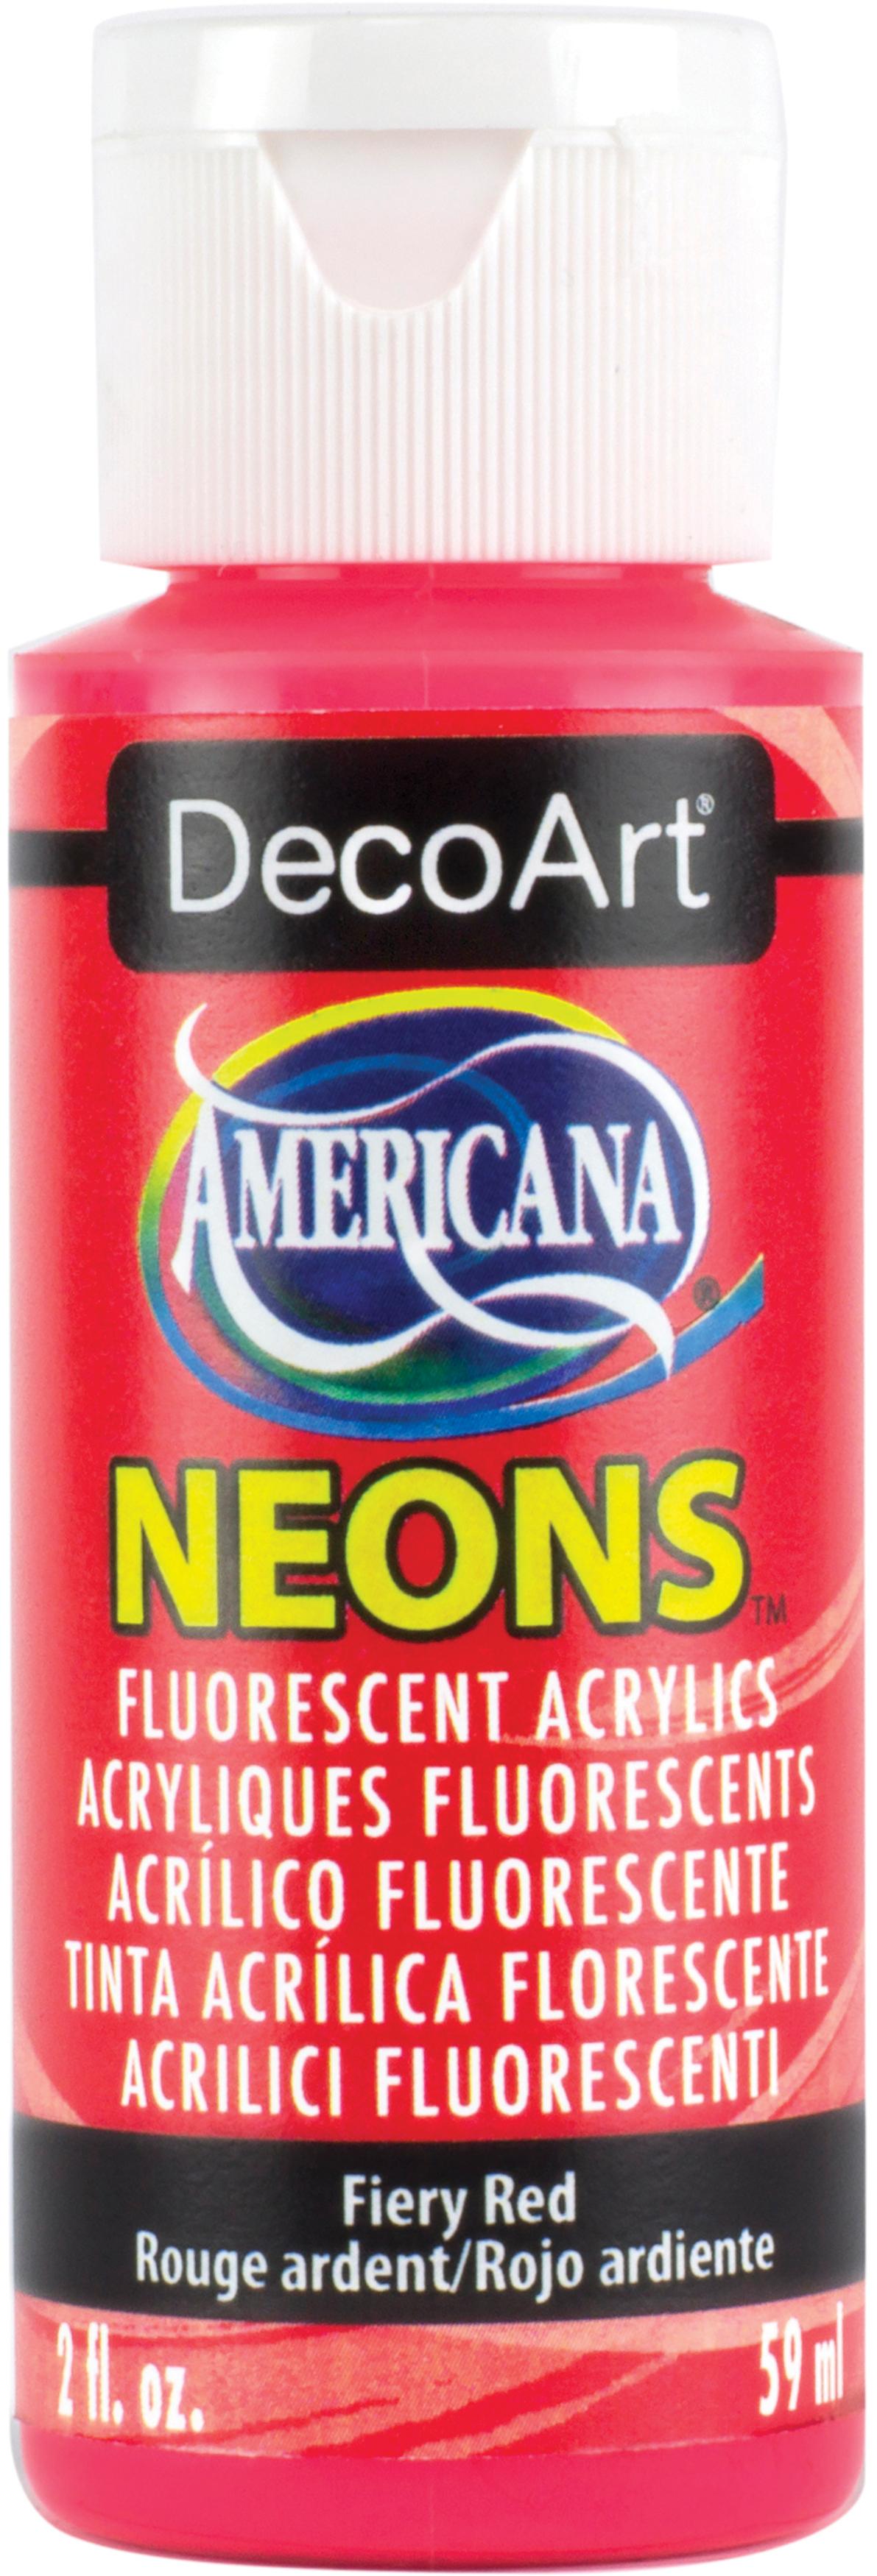 Americana Neons Fluorescent Acrylic Paint 2oz-Scorching Yellow